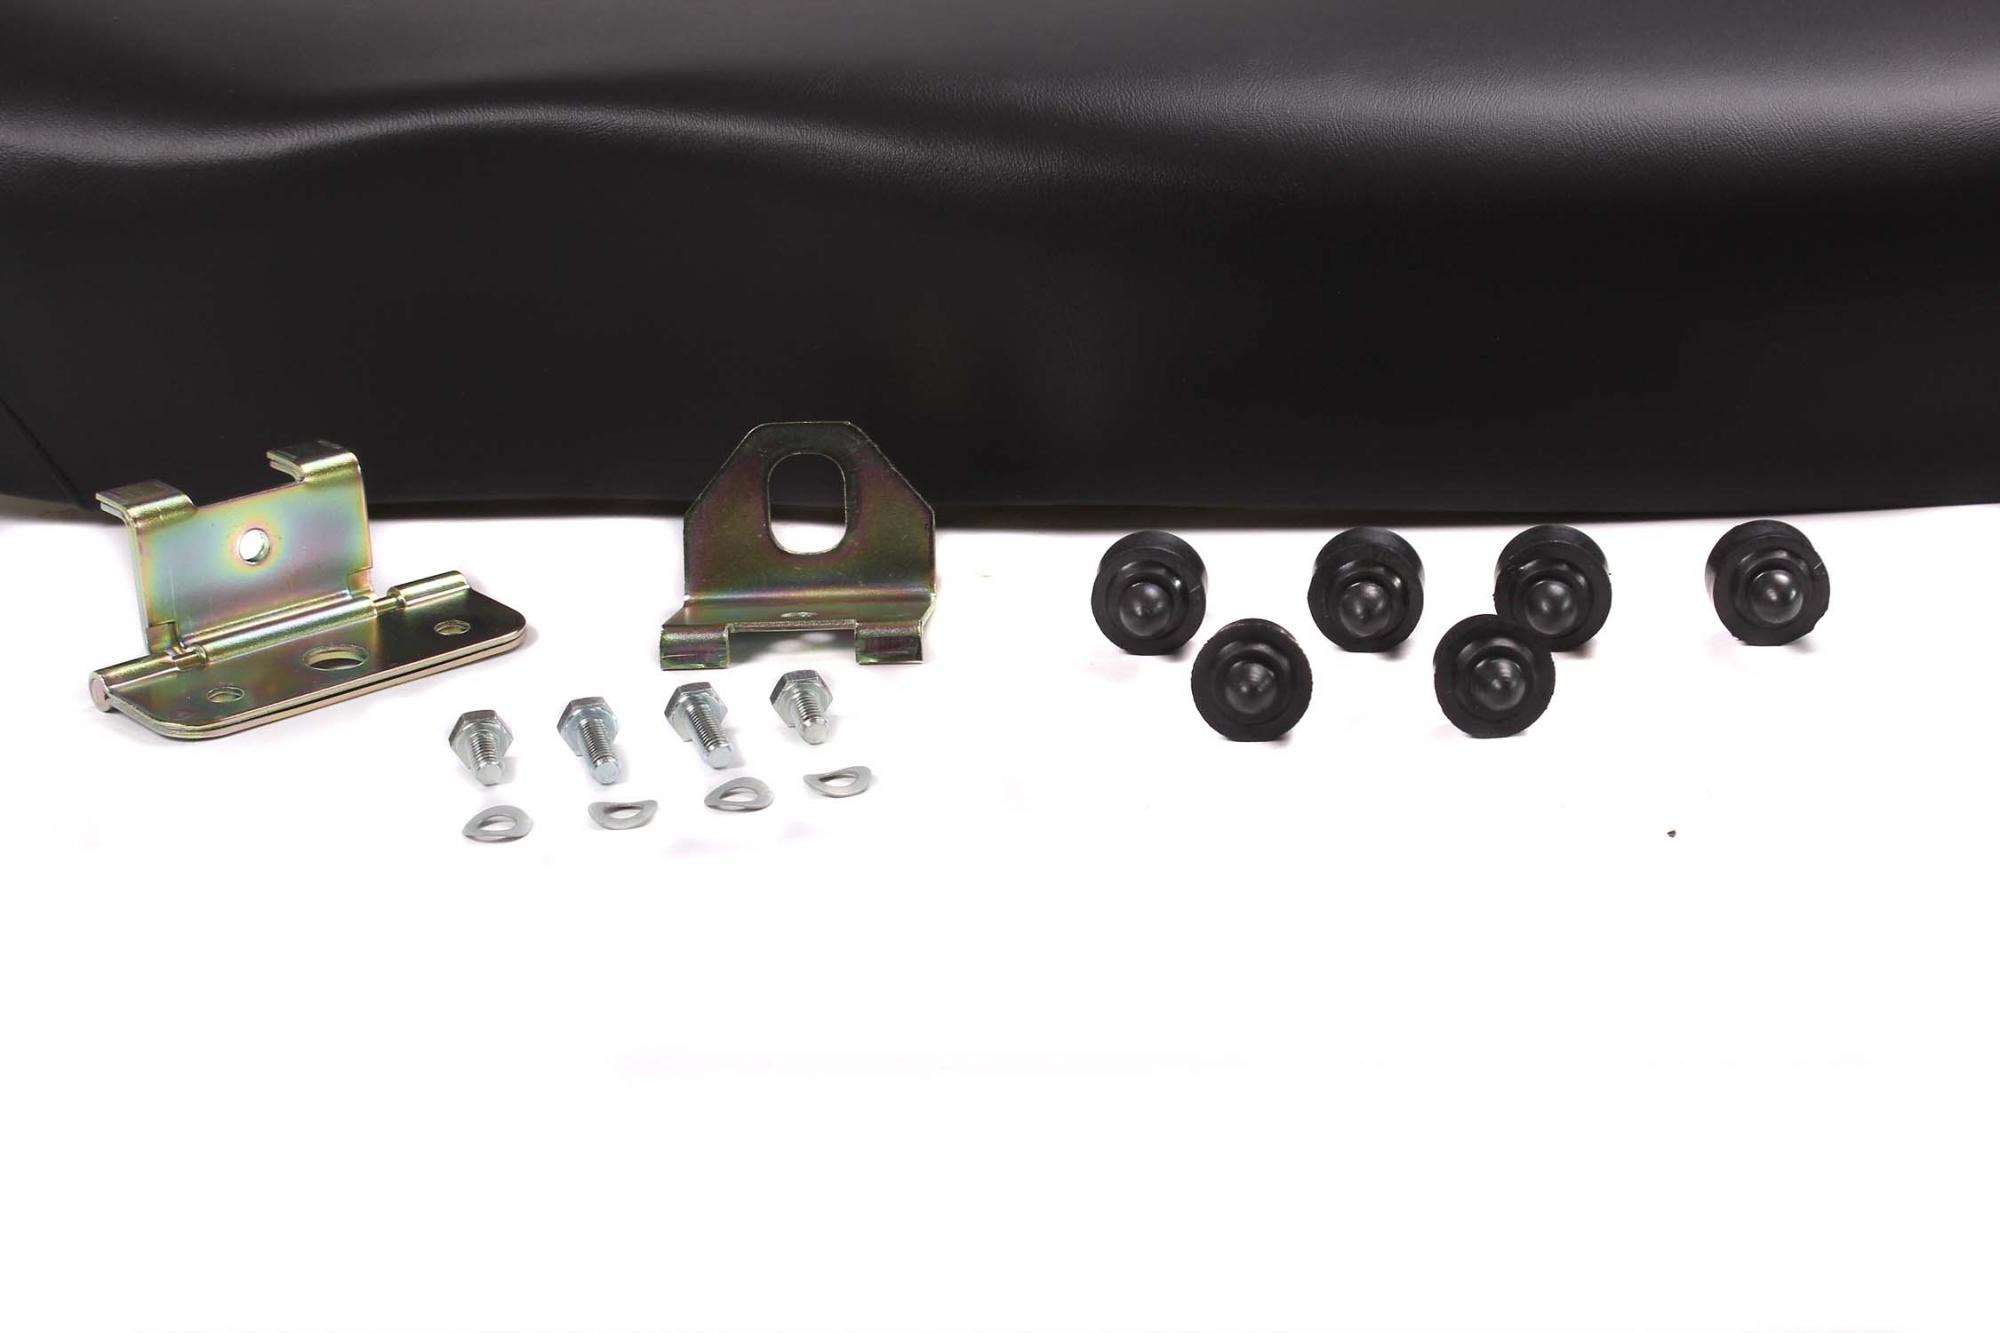 simson schwalbe sitzbank kr51 1 kr51 2 komplett scharnier. Black Bedroom Furniture Sets. Home Design Ideas